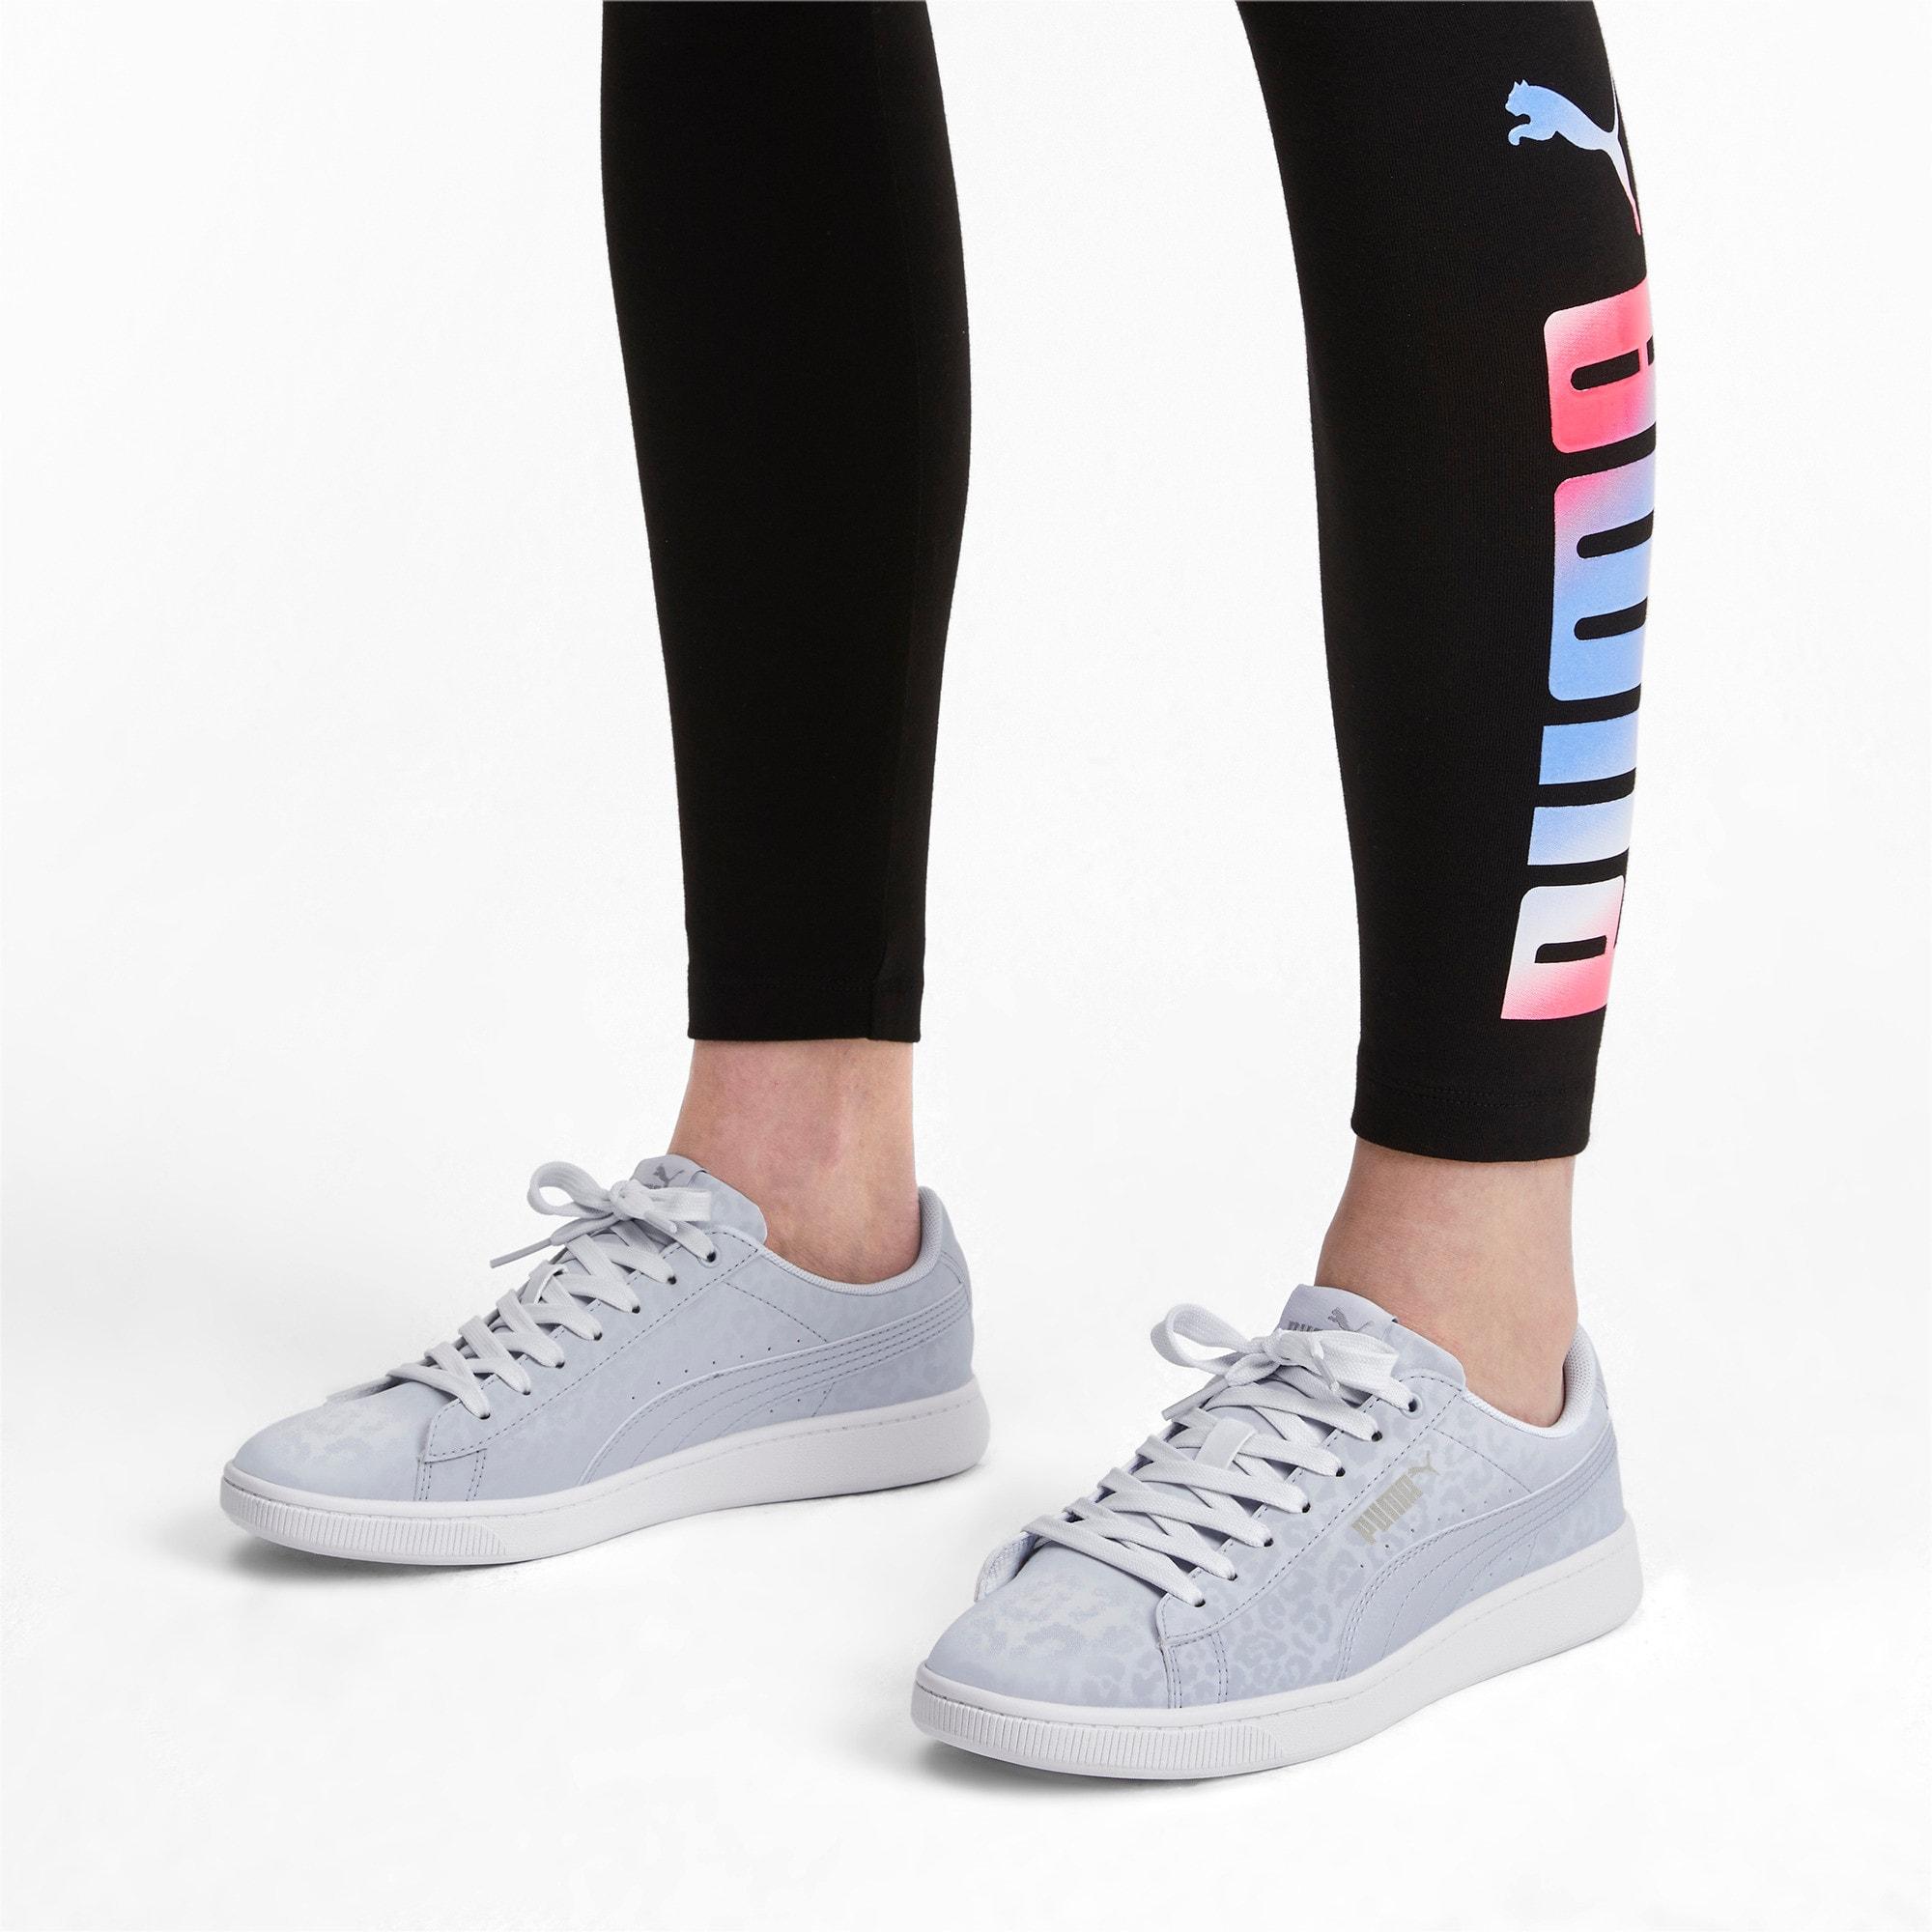 Thumbnail 3 of PUMA Vikky v2 Wildcat Women's Sneakers, Heather-Puma Silver-White, medium